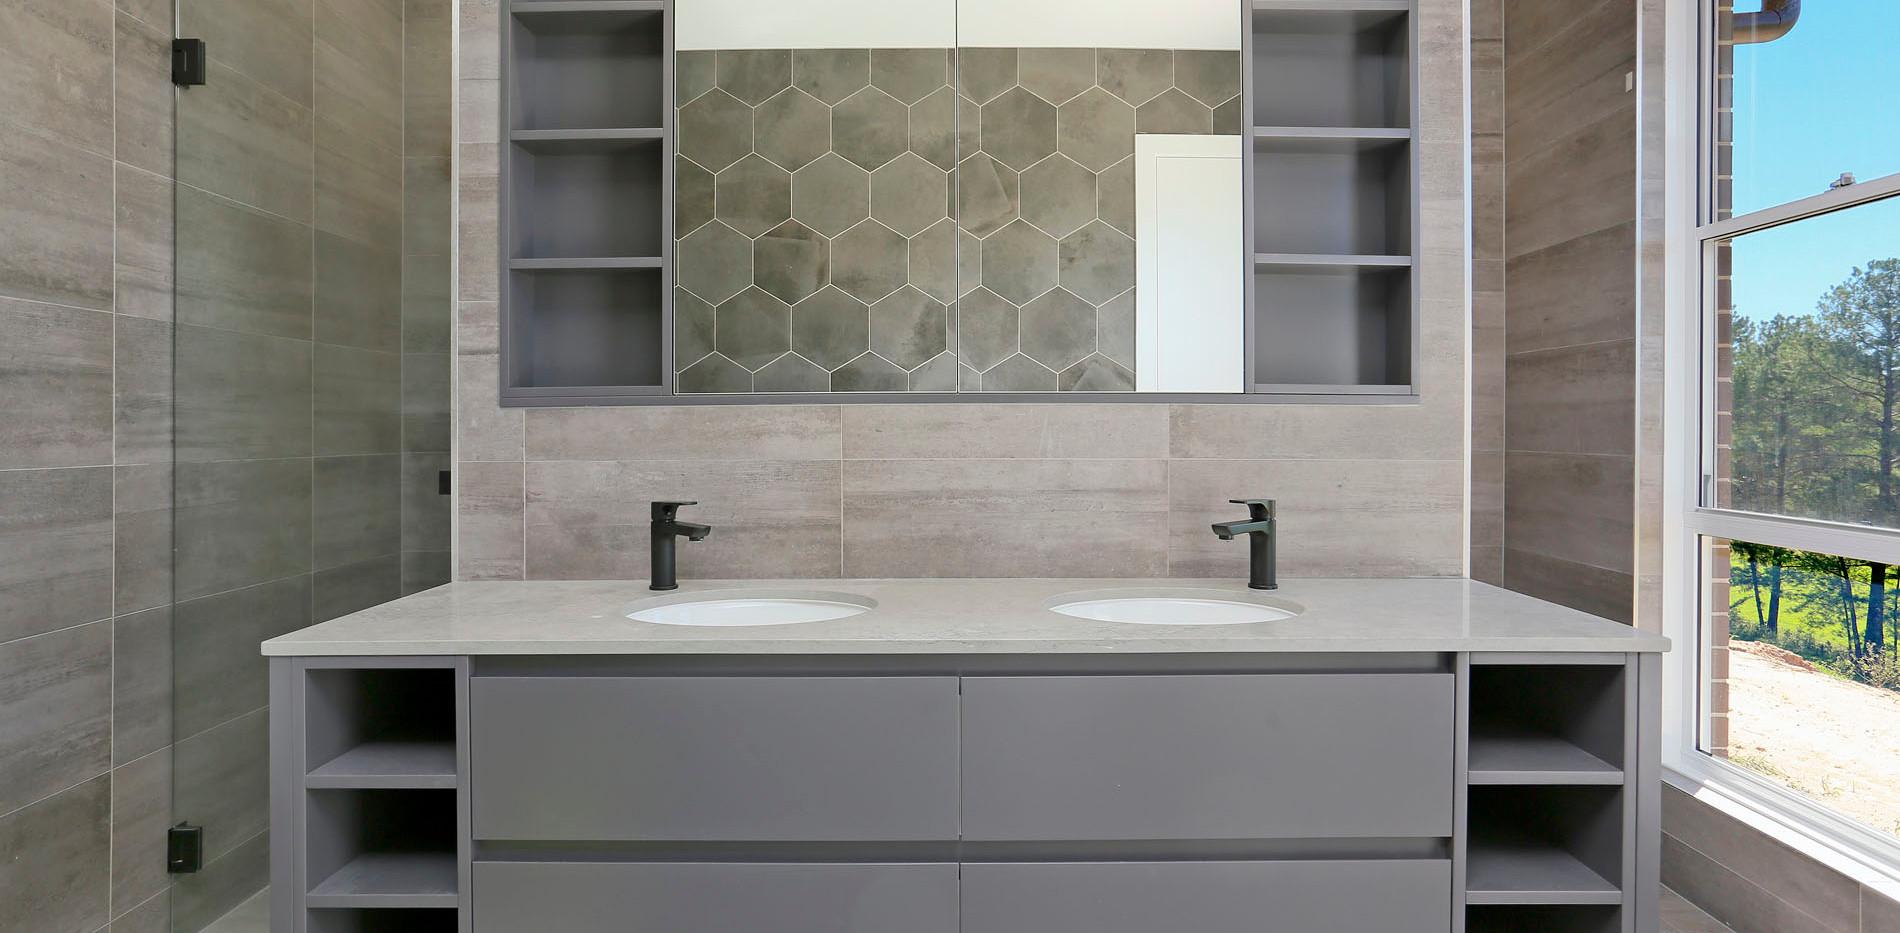 Hawkesbury bathrooms and Kitchens (3)